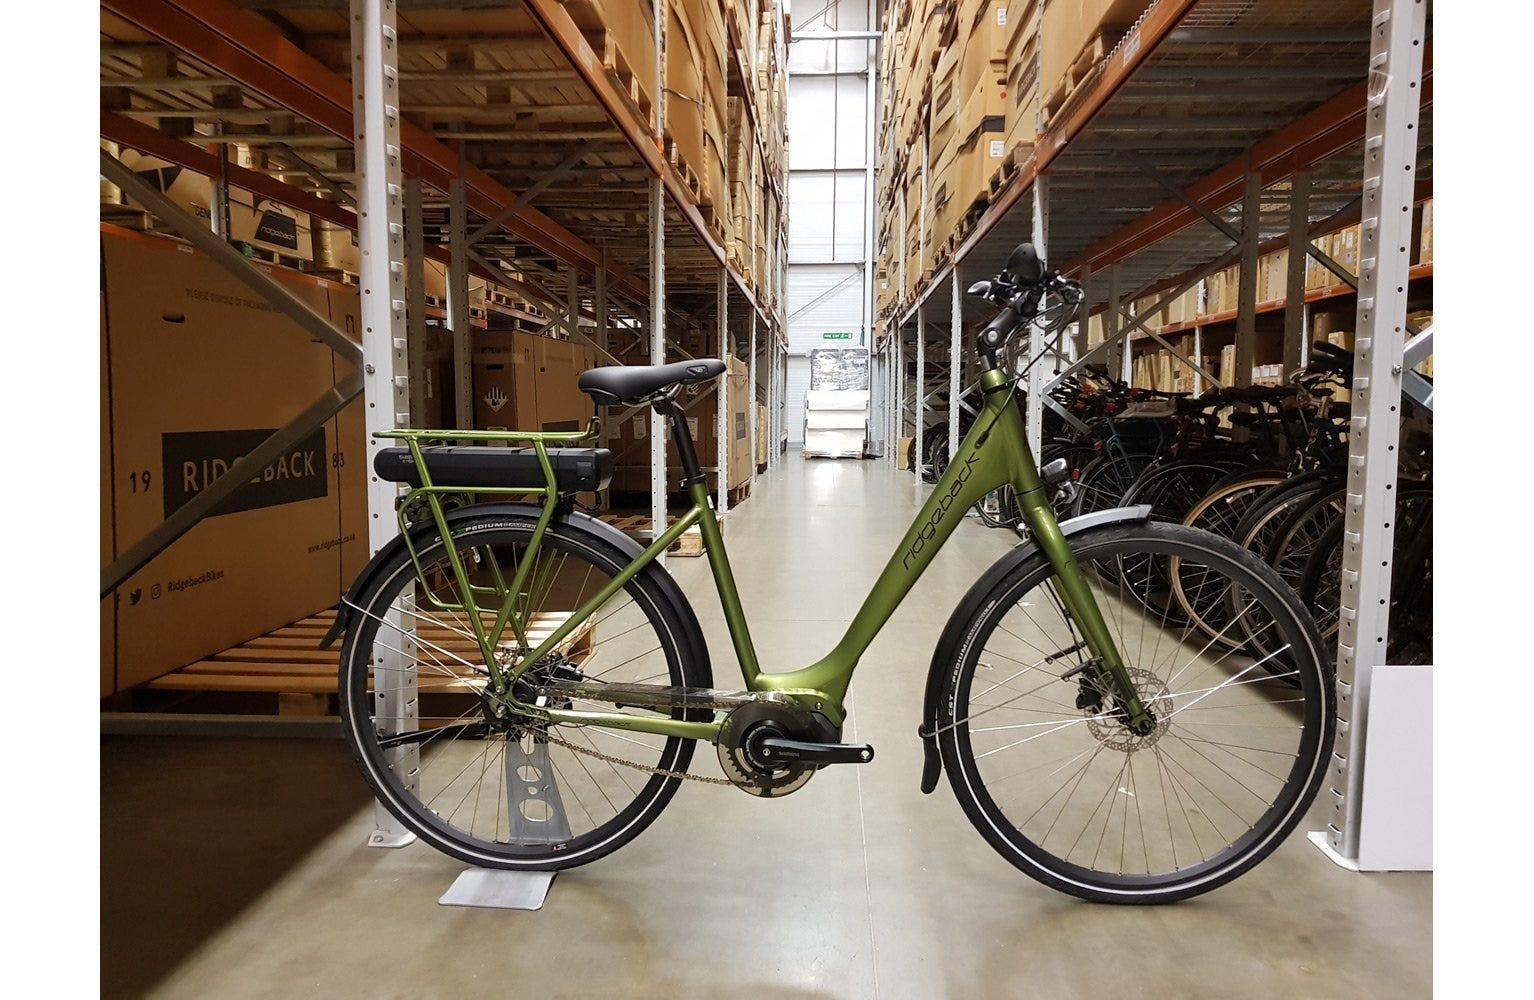 Ridgeback 2018 Electron DI2 M/L ALt Colour Bike sample (used)